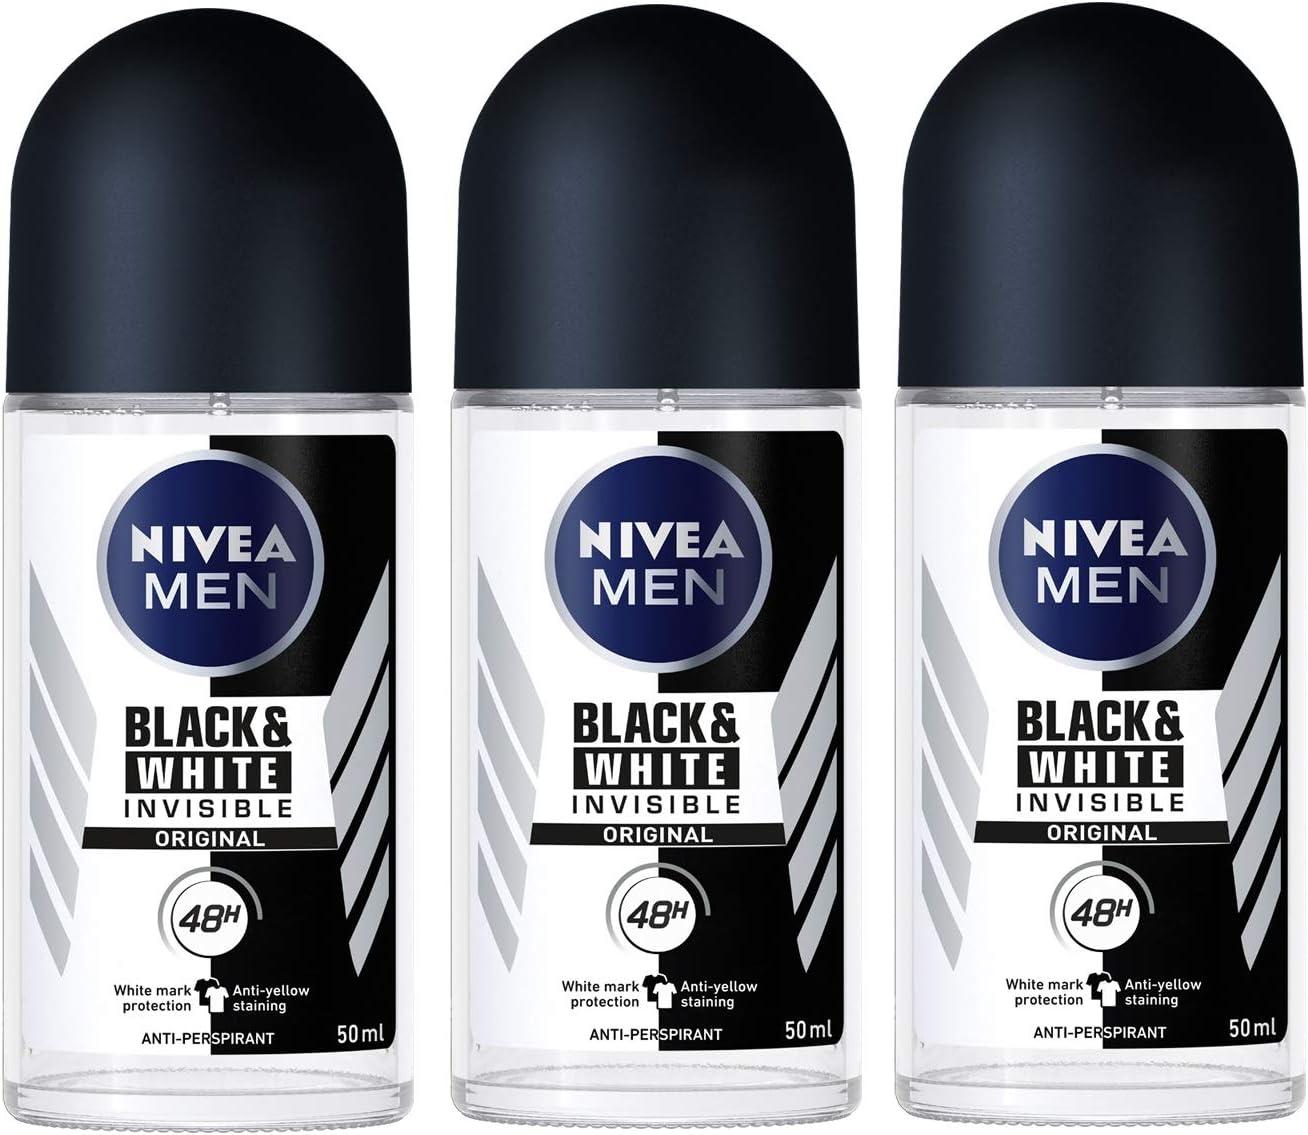 Nivea for Men Invisible for Black & White Deodorant roll-on